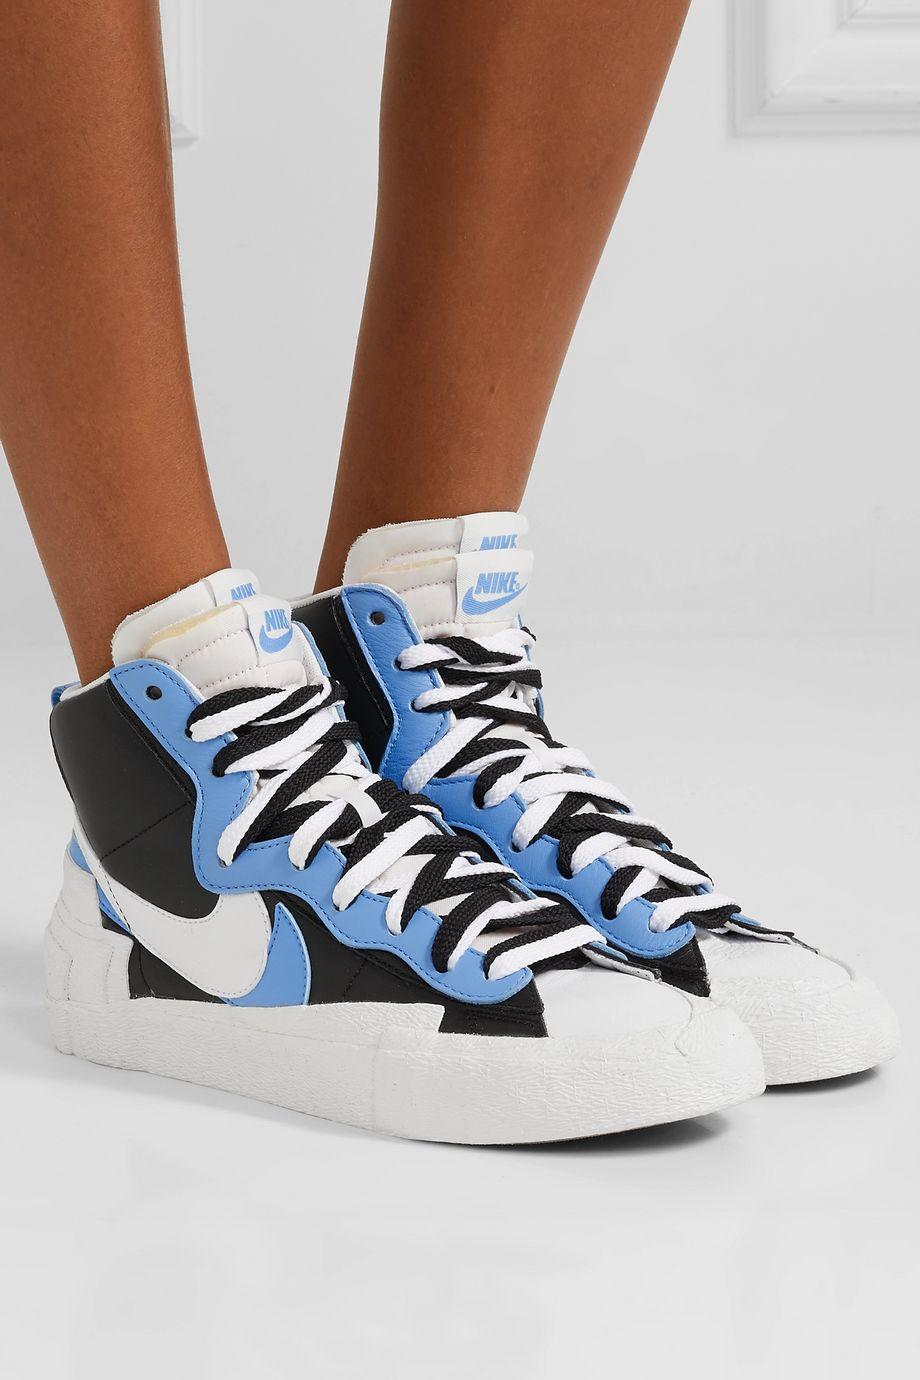 Nike + Sacai Blazer Mid leather high-top sneakers